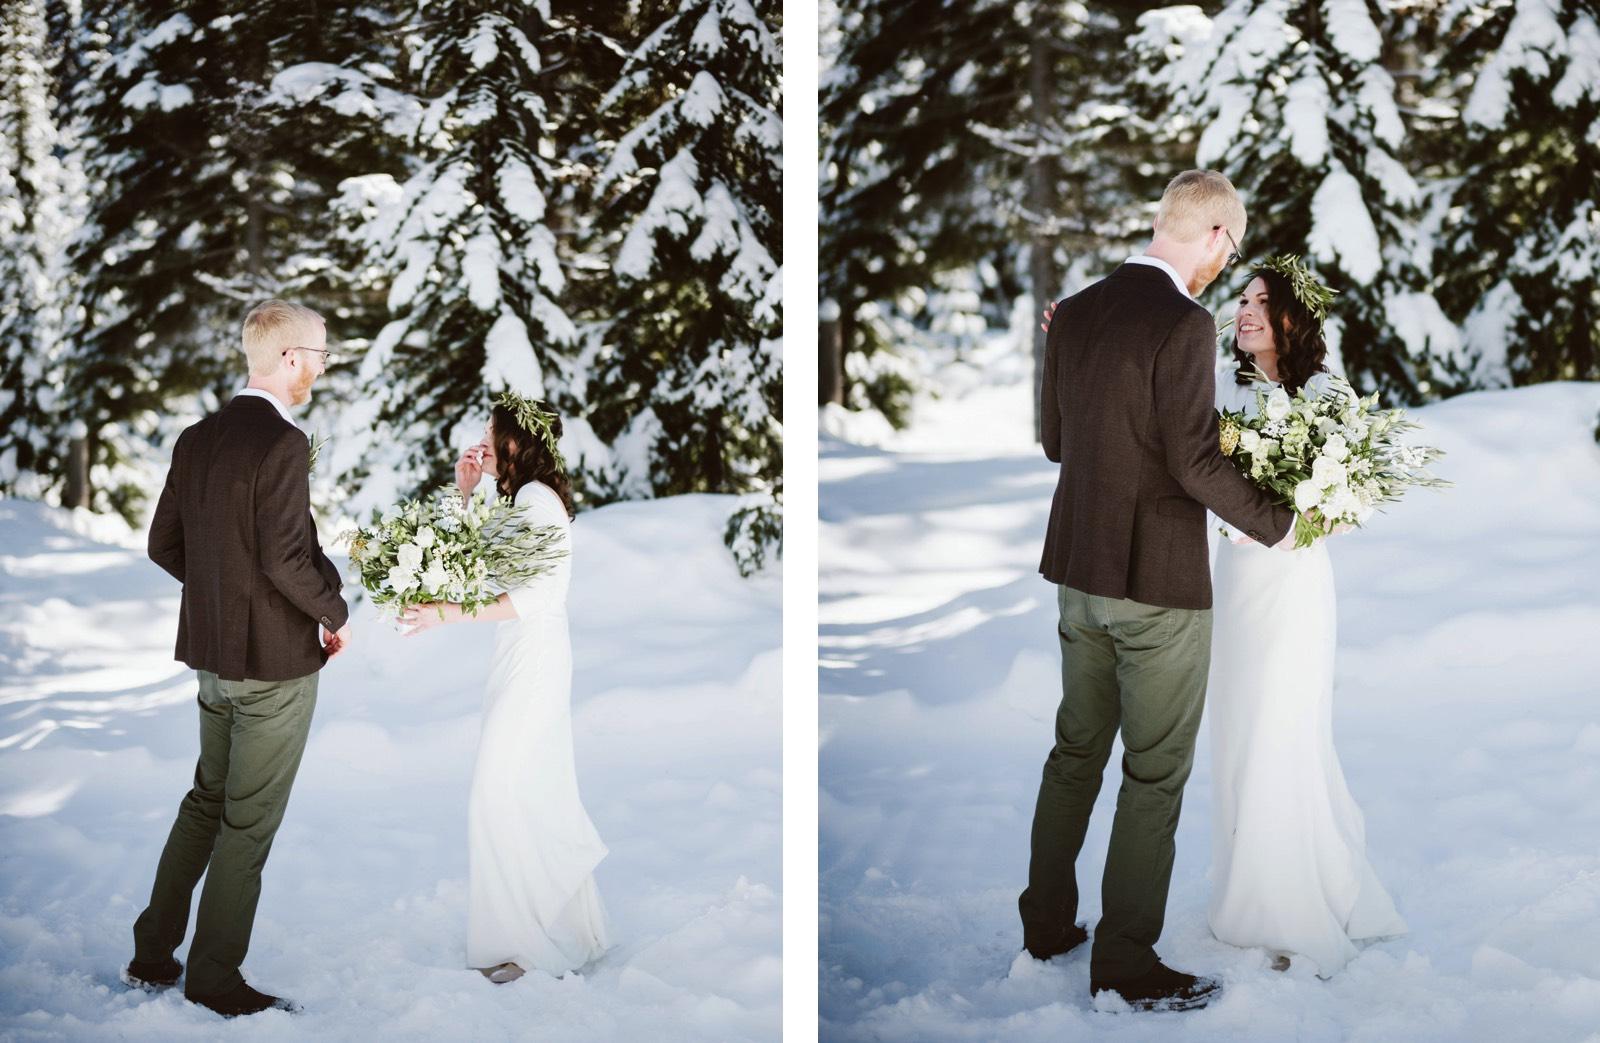 alpine-lakes-high-camp-winter-wedding-18 ALPINE LAKES HIGH CAMP WEDDING